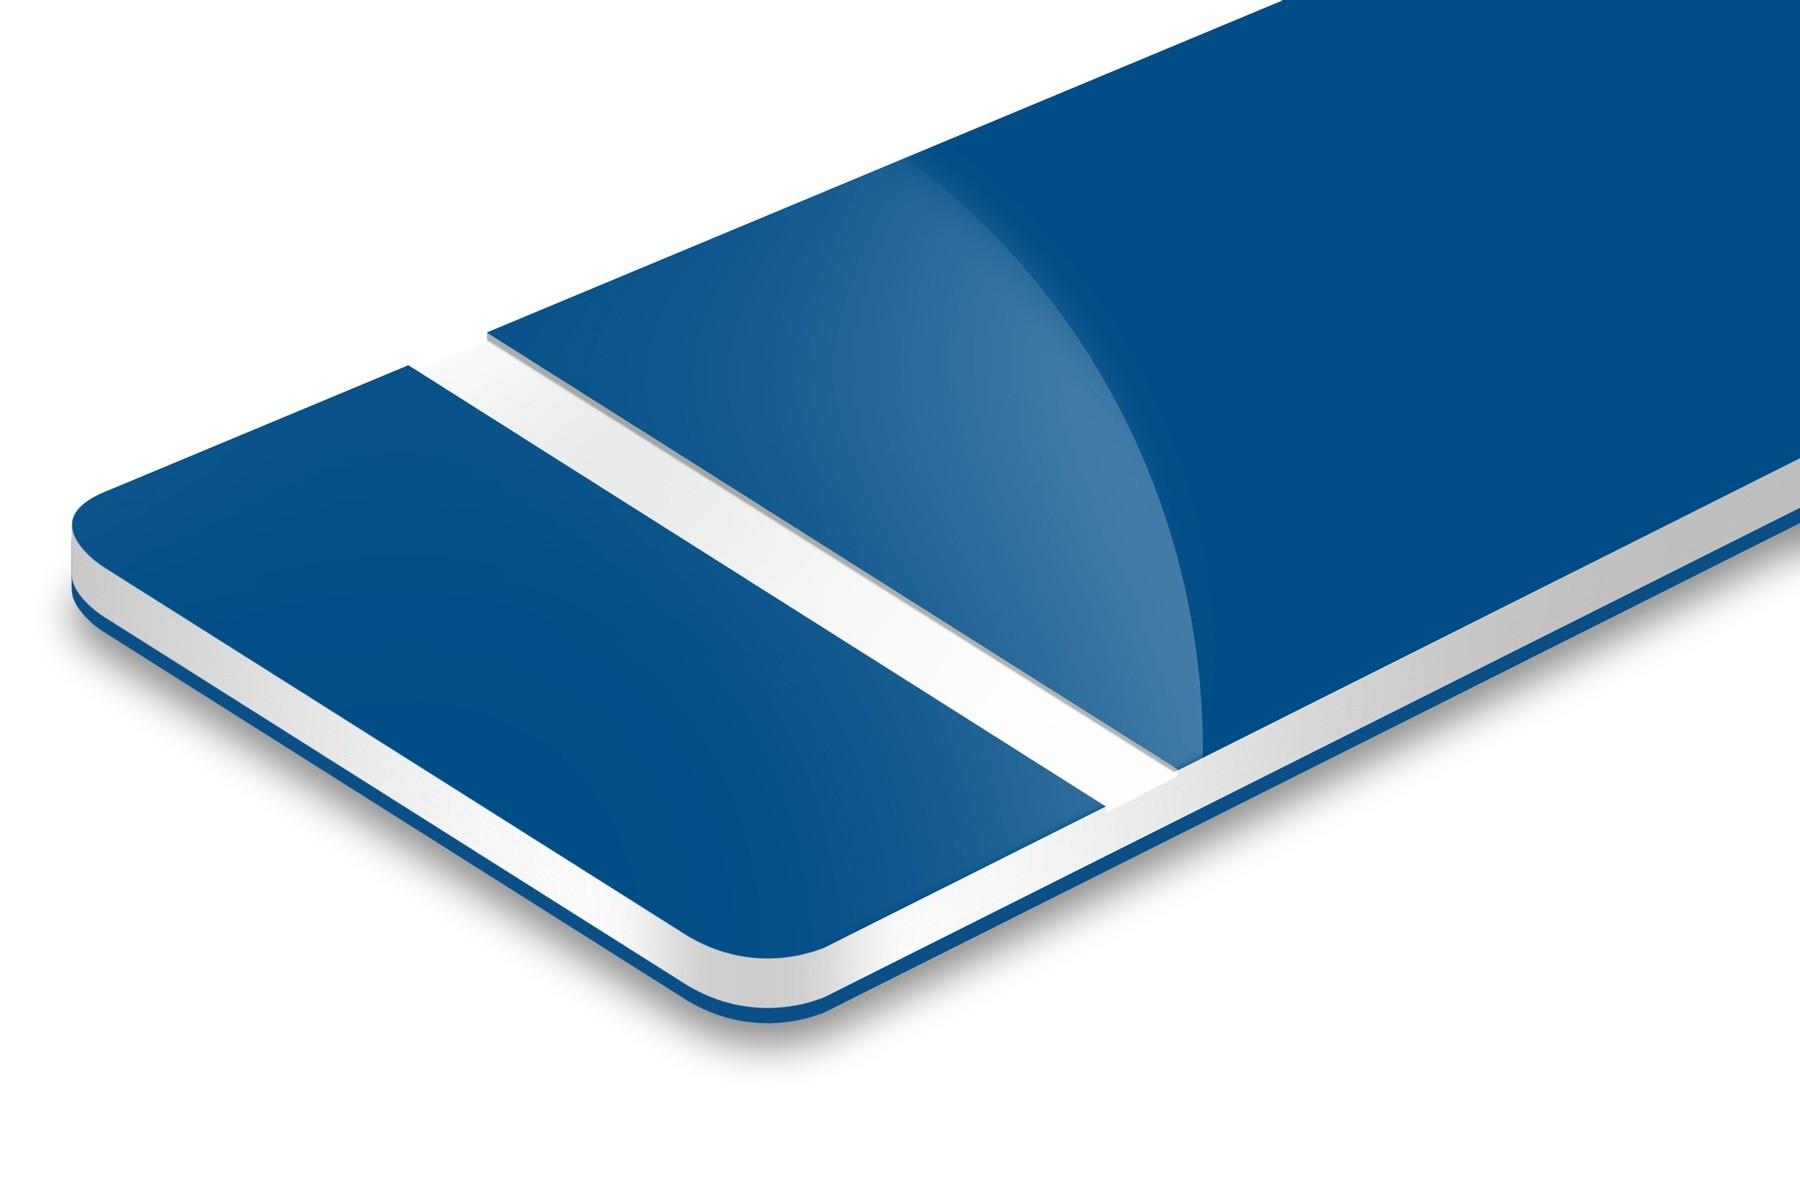 PH512-306 Blue/White/Blue 1,6mm